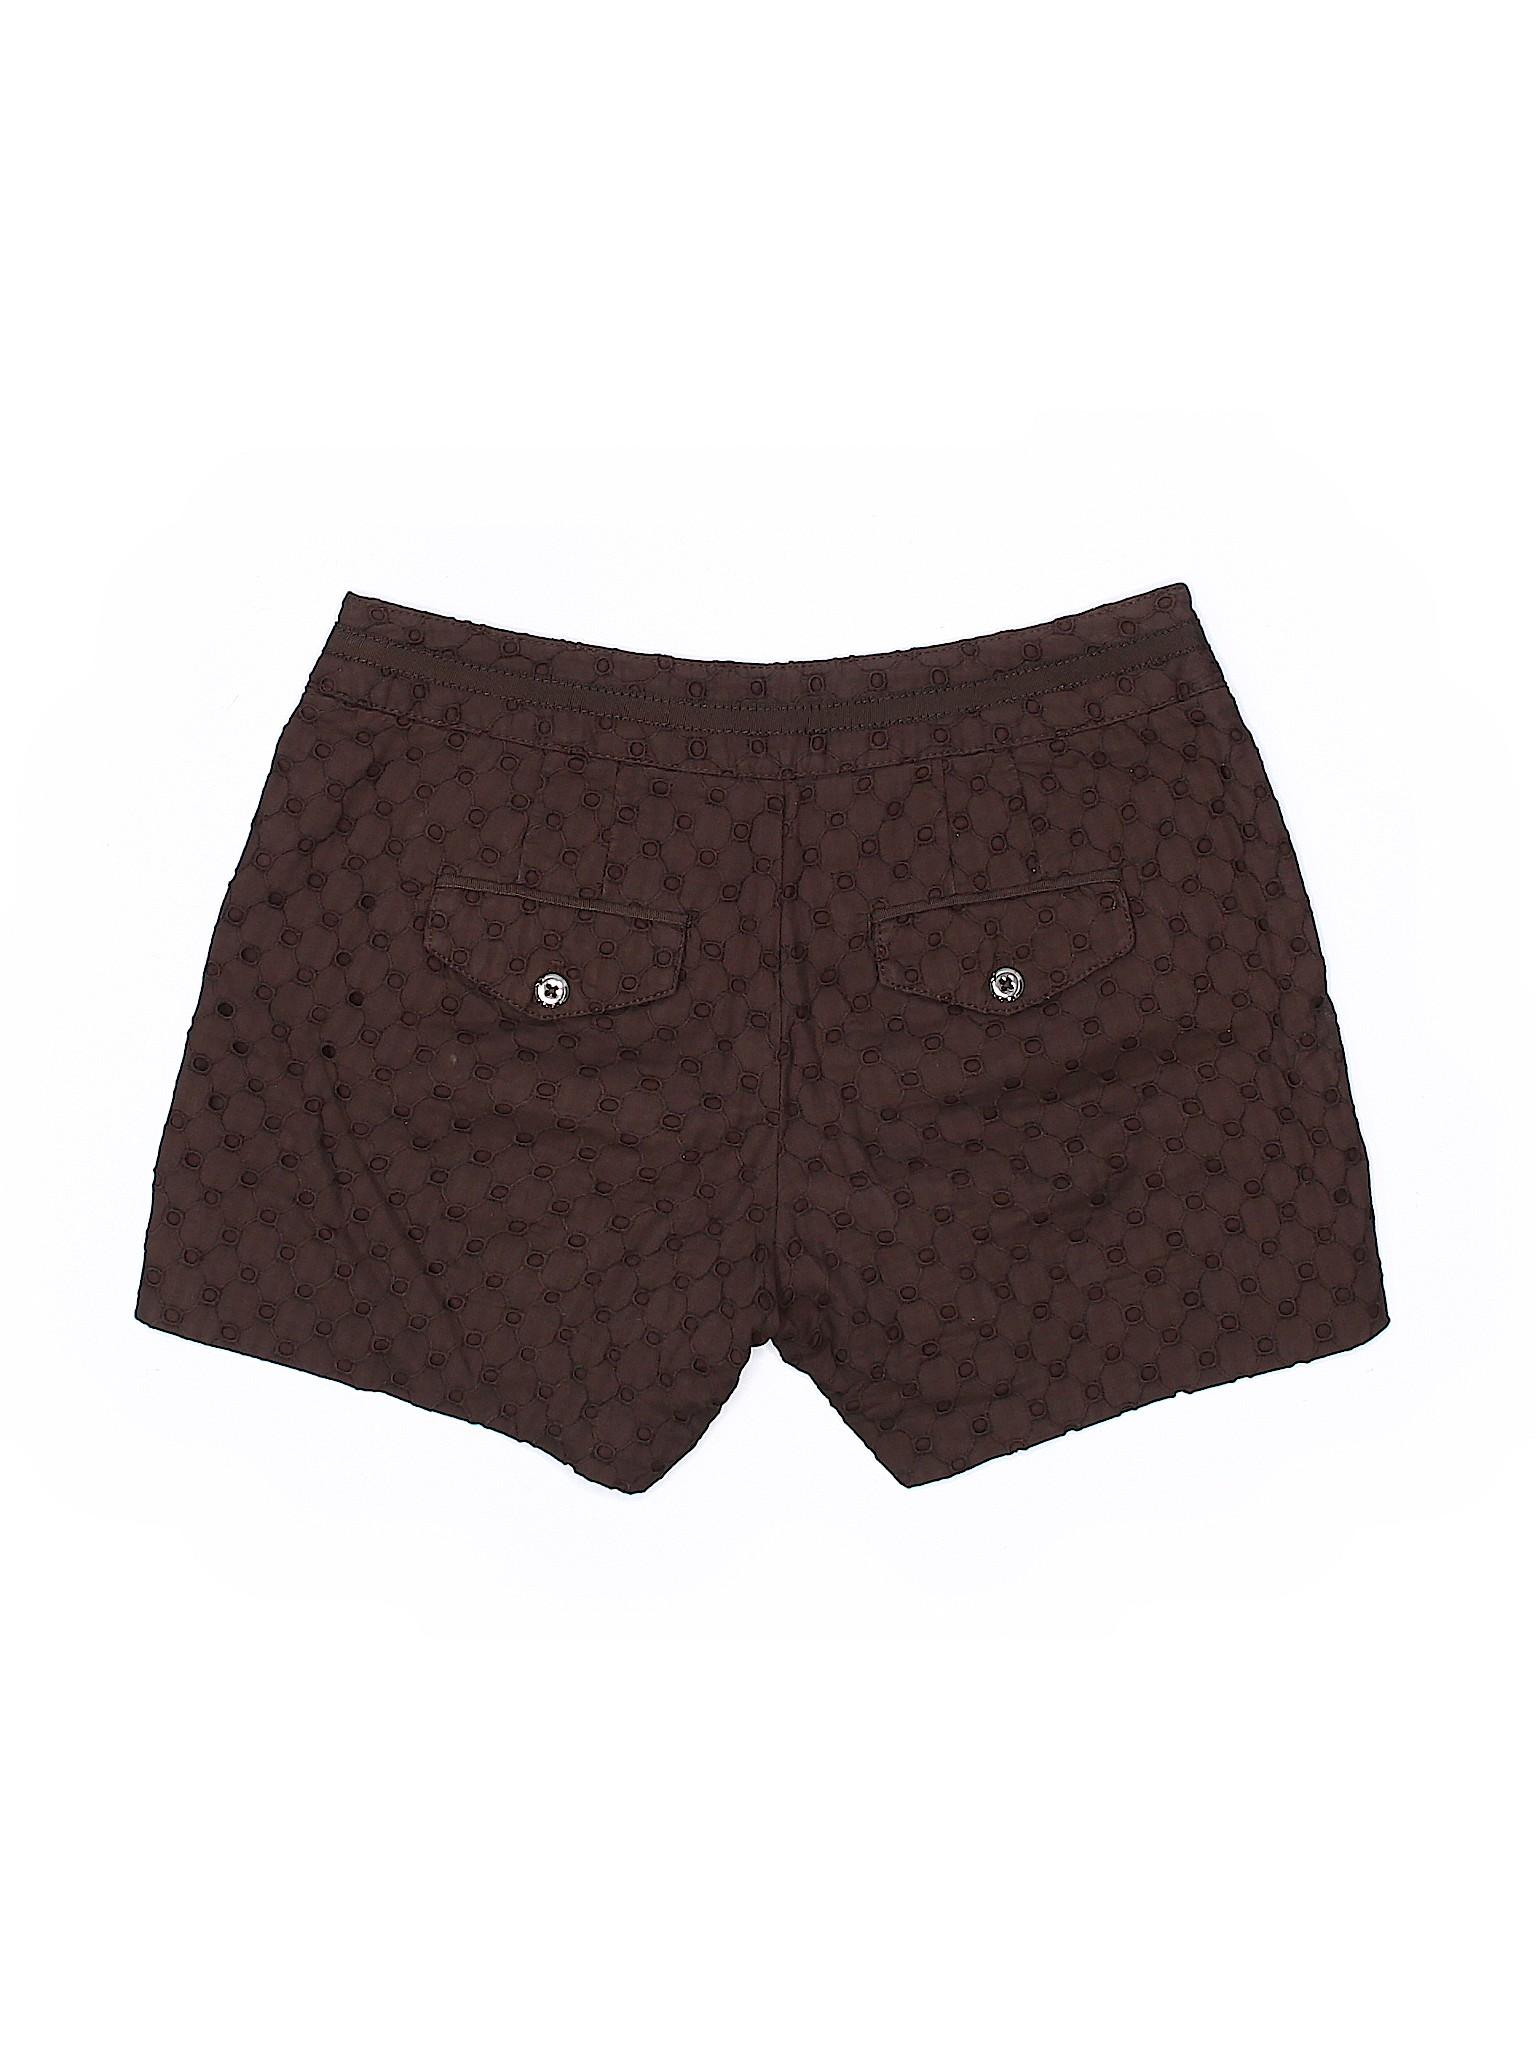 Boutique White leisure Shorts Black House Market nFn7v